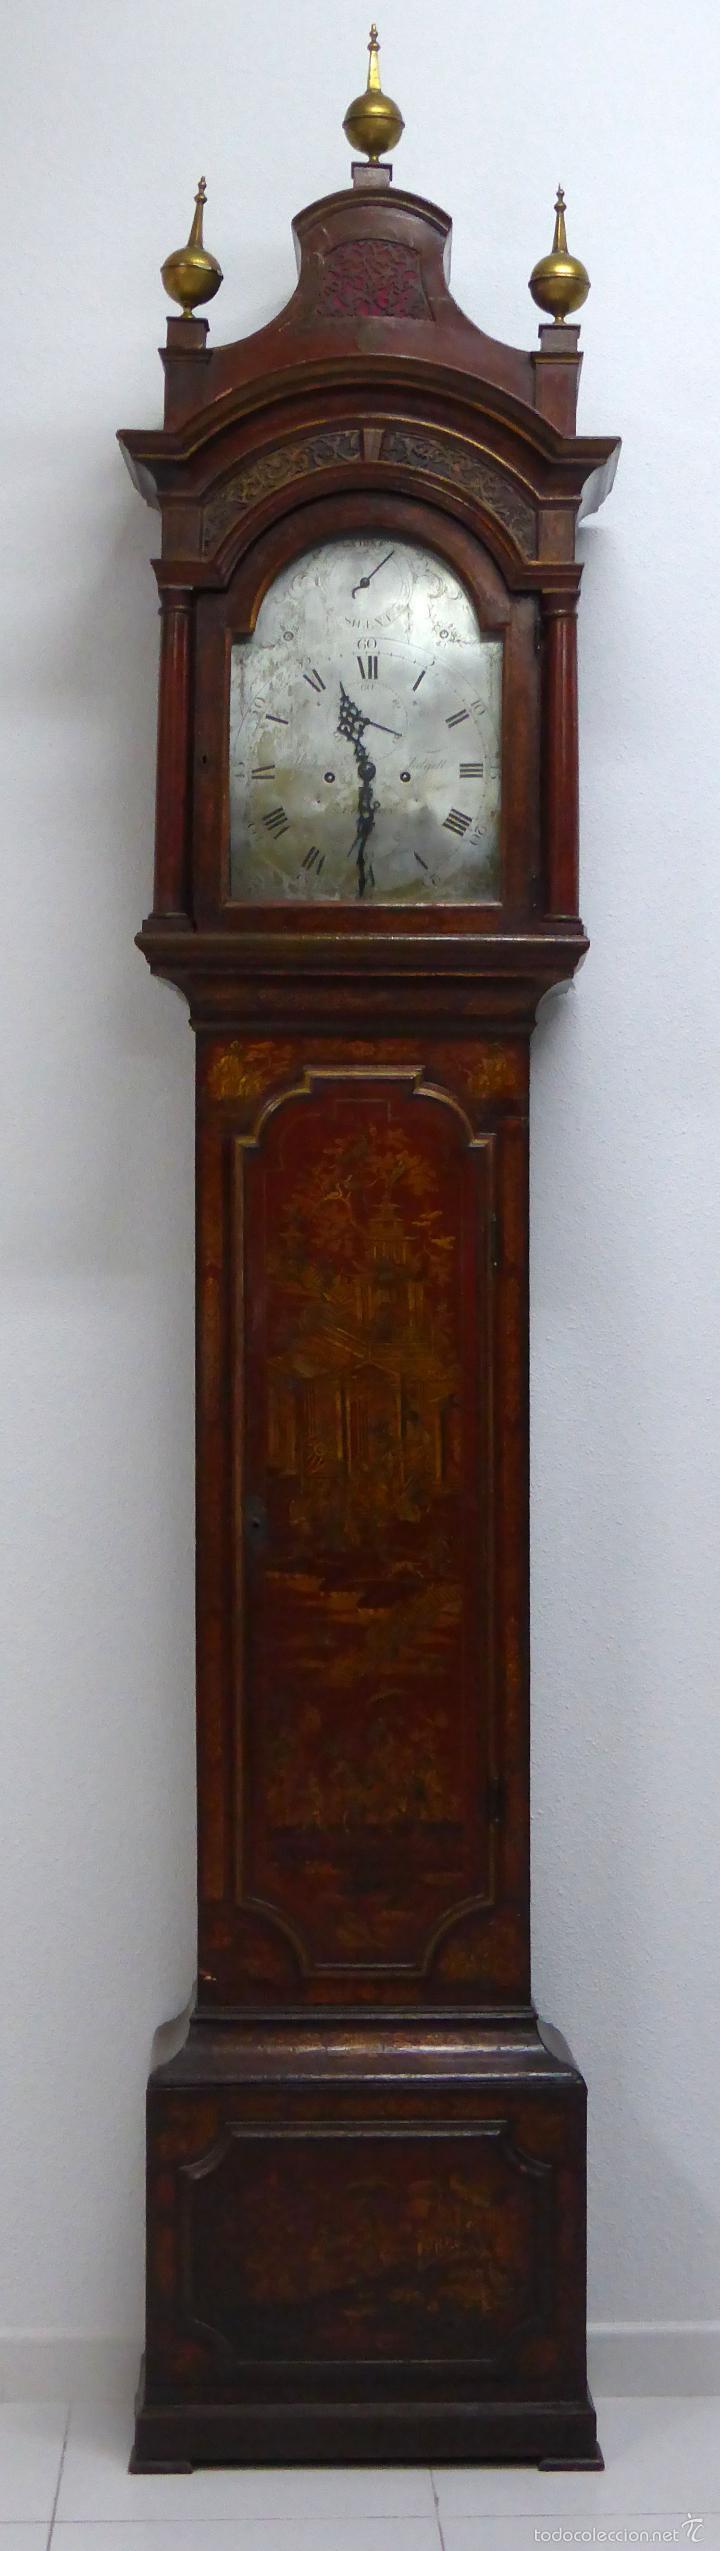 RELOJ PIE INGLÉS LACA JAPANNING CHINOSERIES S XVIII MAQUINARIA WILLIAM FIDGETT LONDON FUNCIONA (Relojes - Pie Carga Manual)